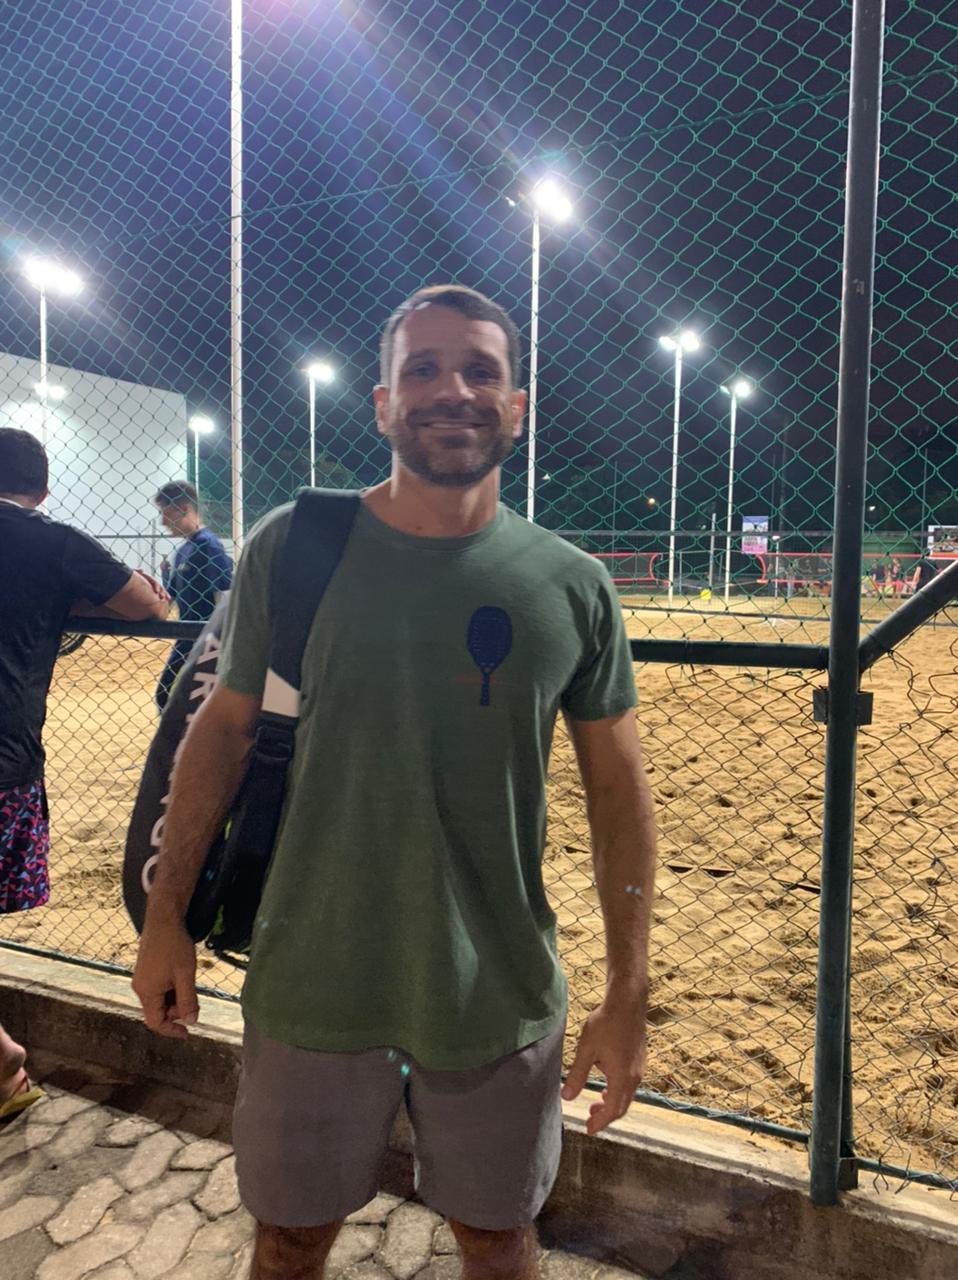 Camiseta T-Shirt Stone Beach Tennis Raquete Costas 2 - Verde Musgo